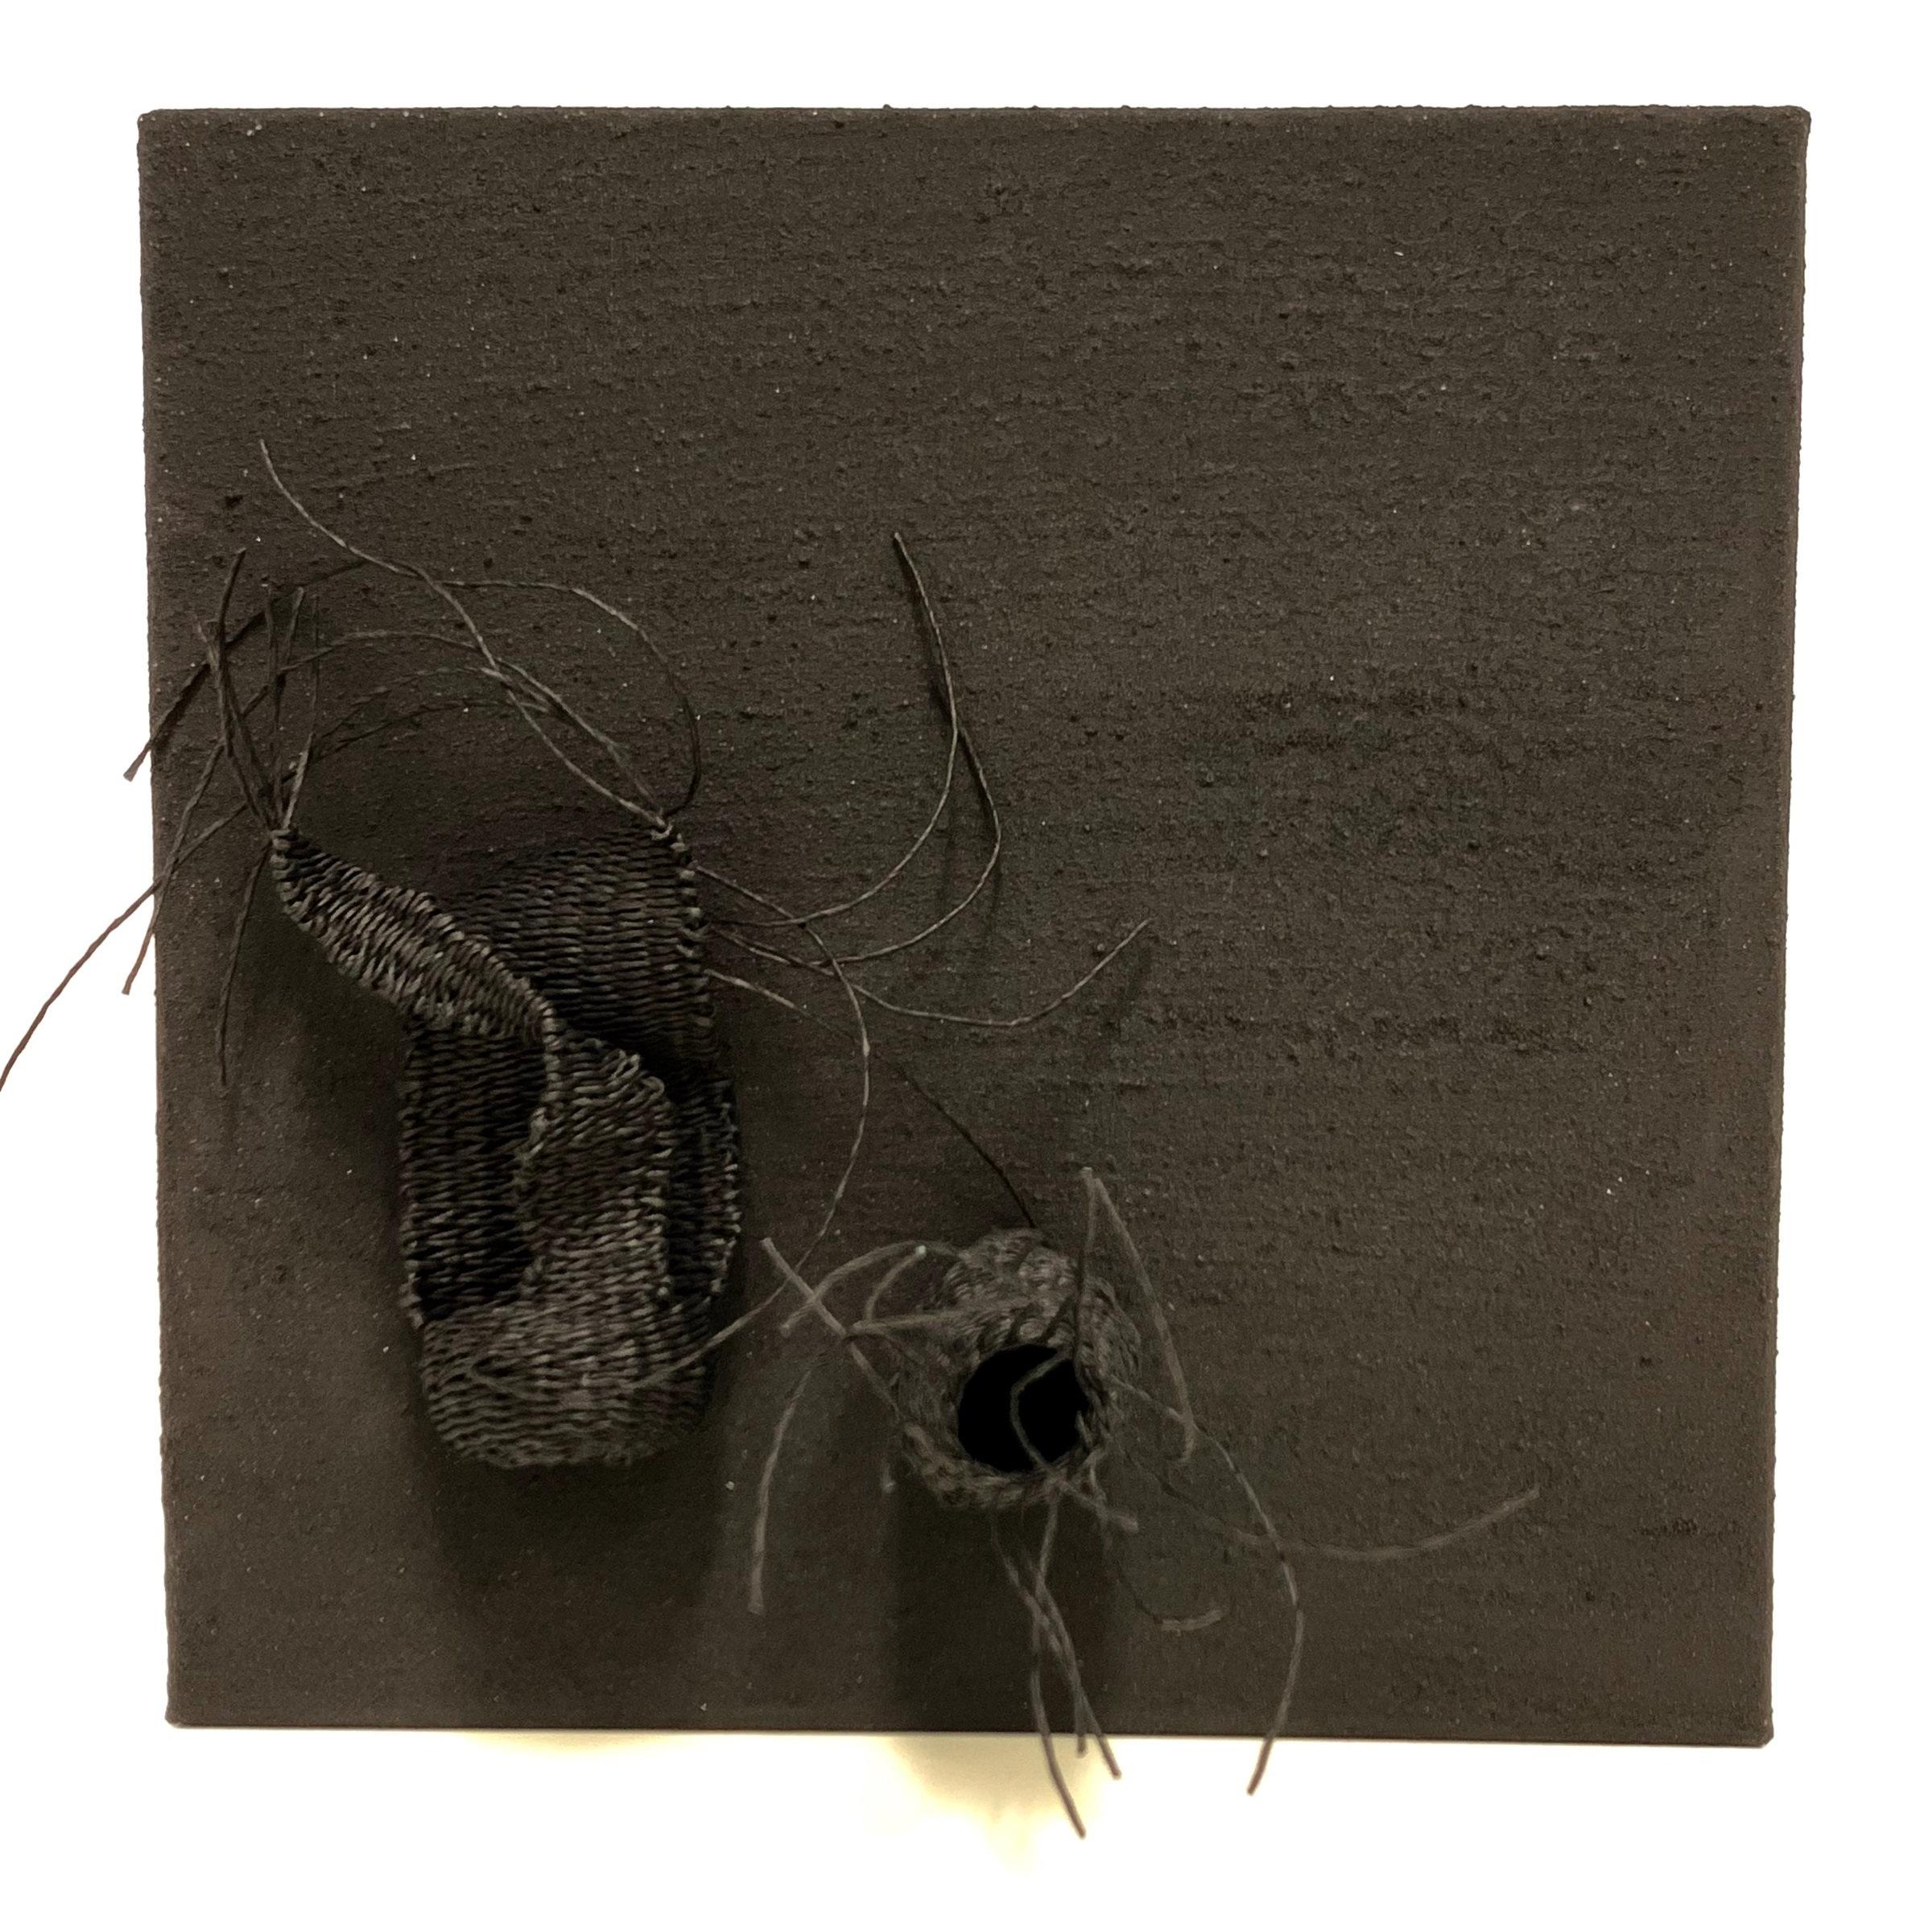 Catriona Pollard 'In The Black II' $420